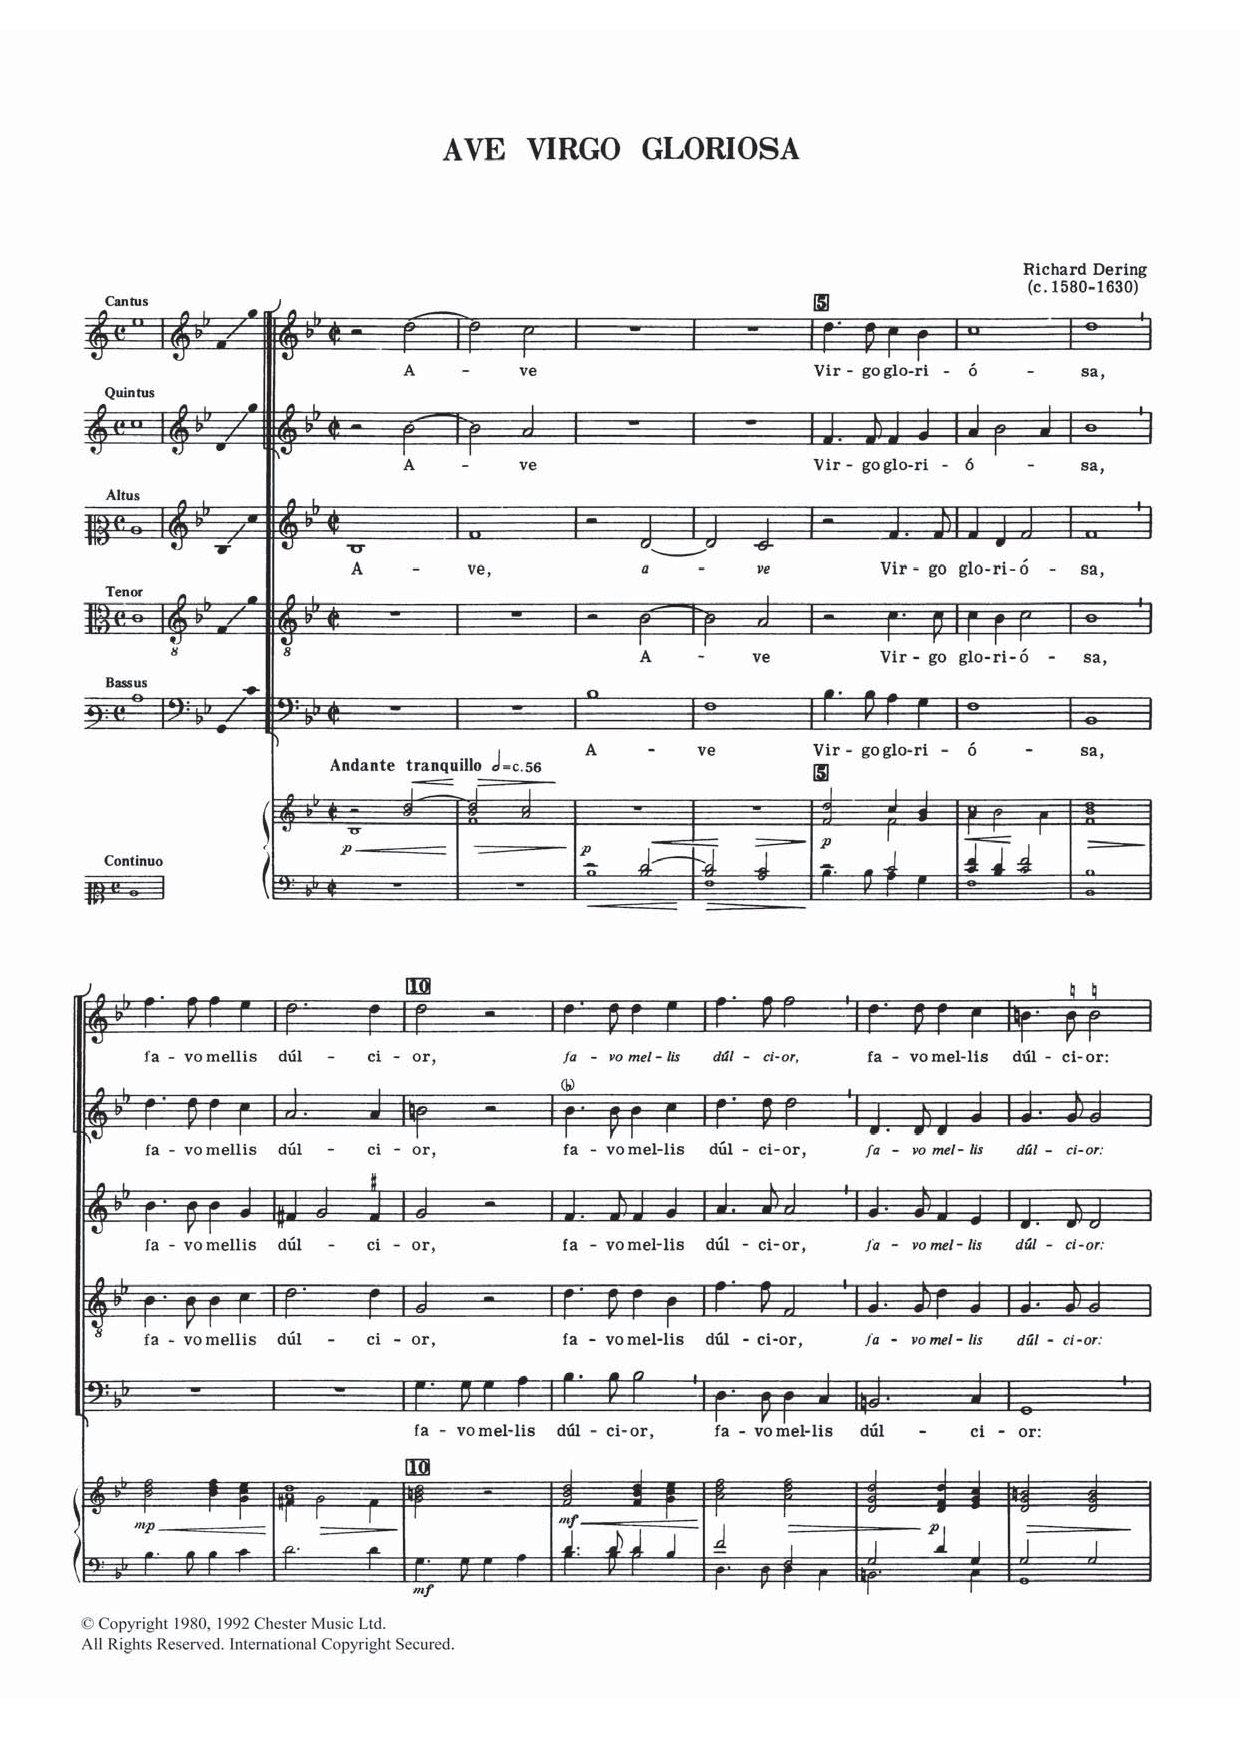 Richard Dering - Ave Virgo Gloriosa